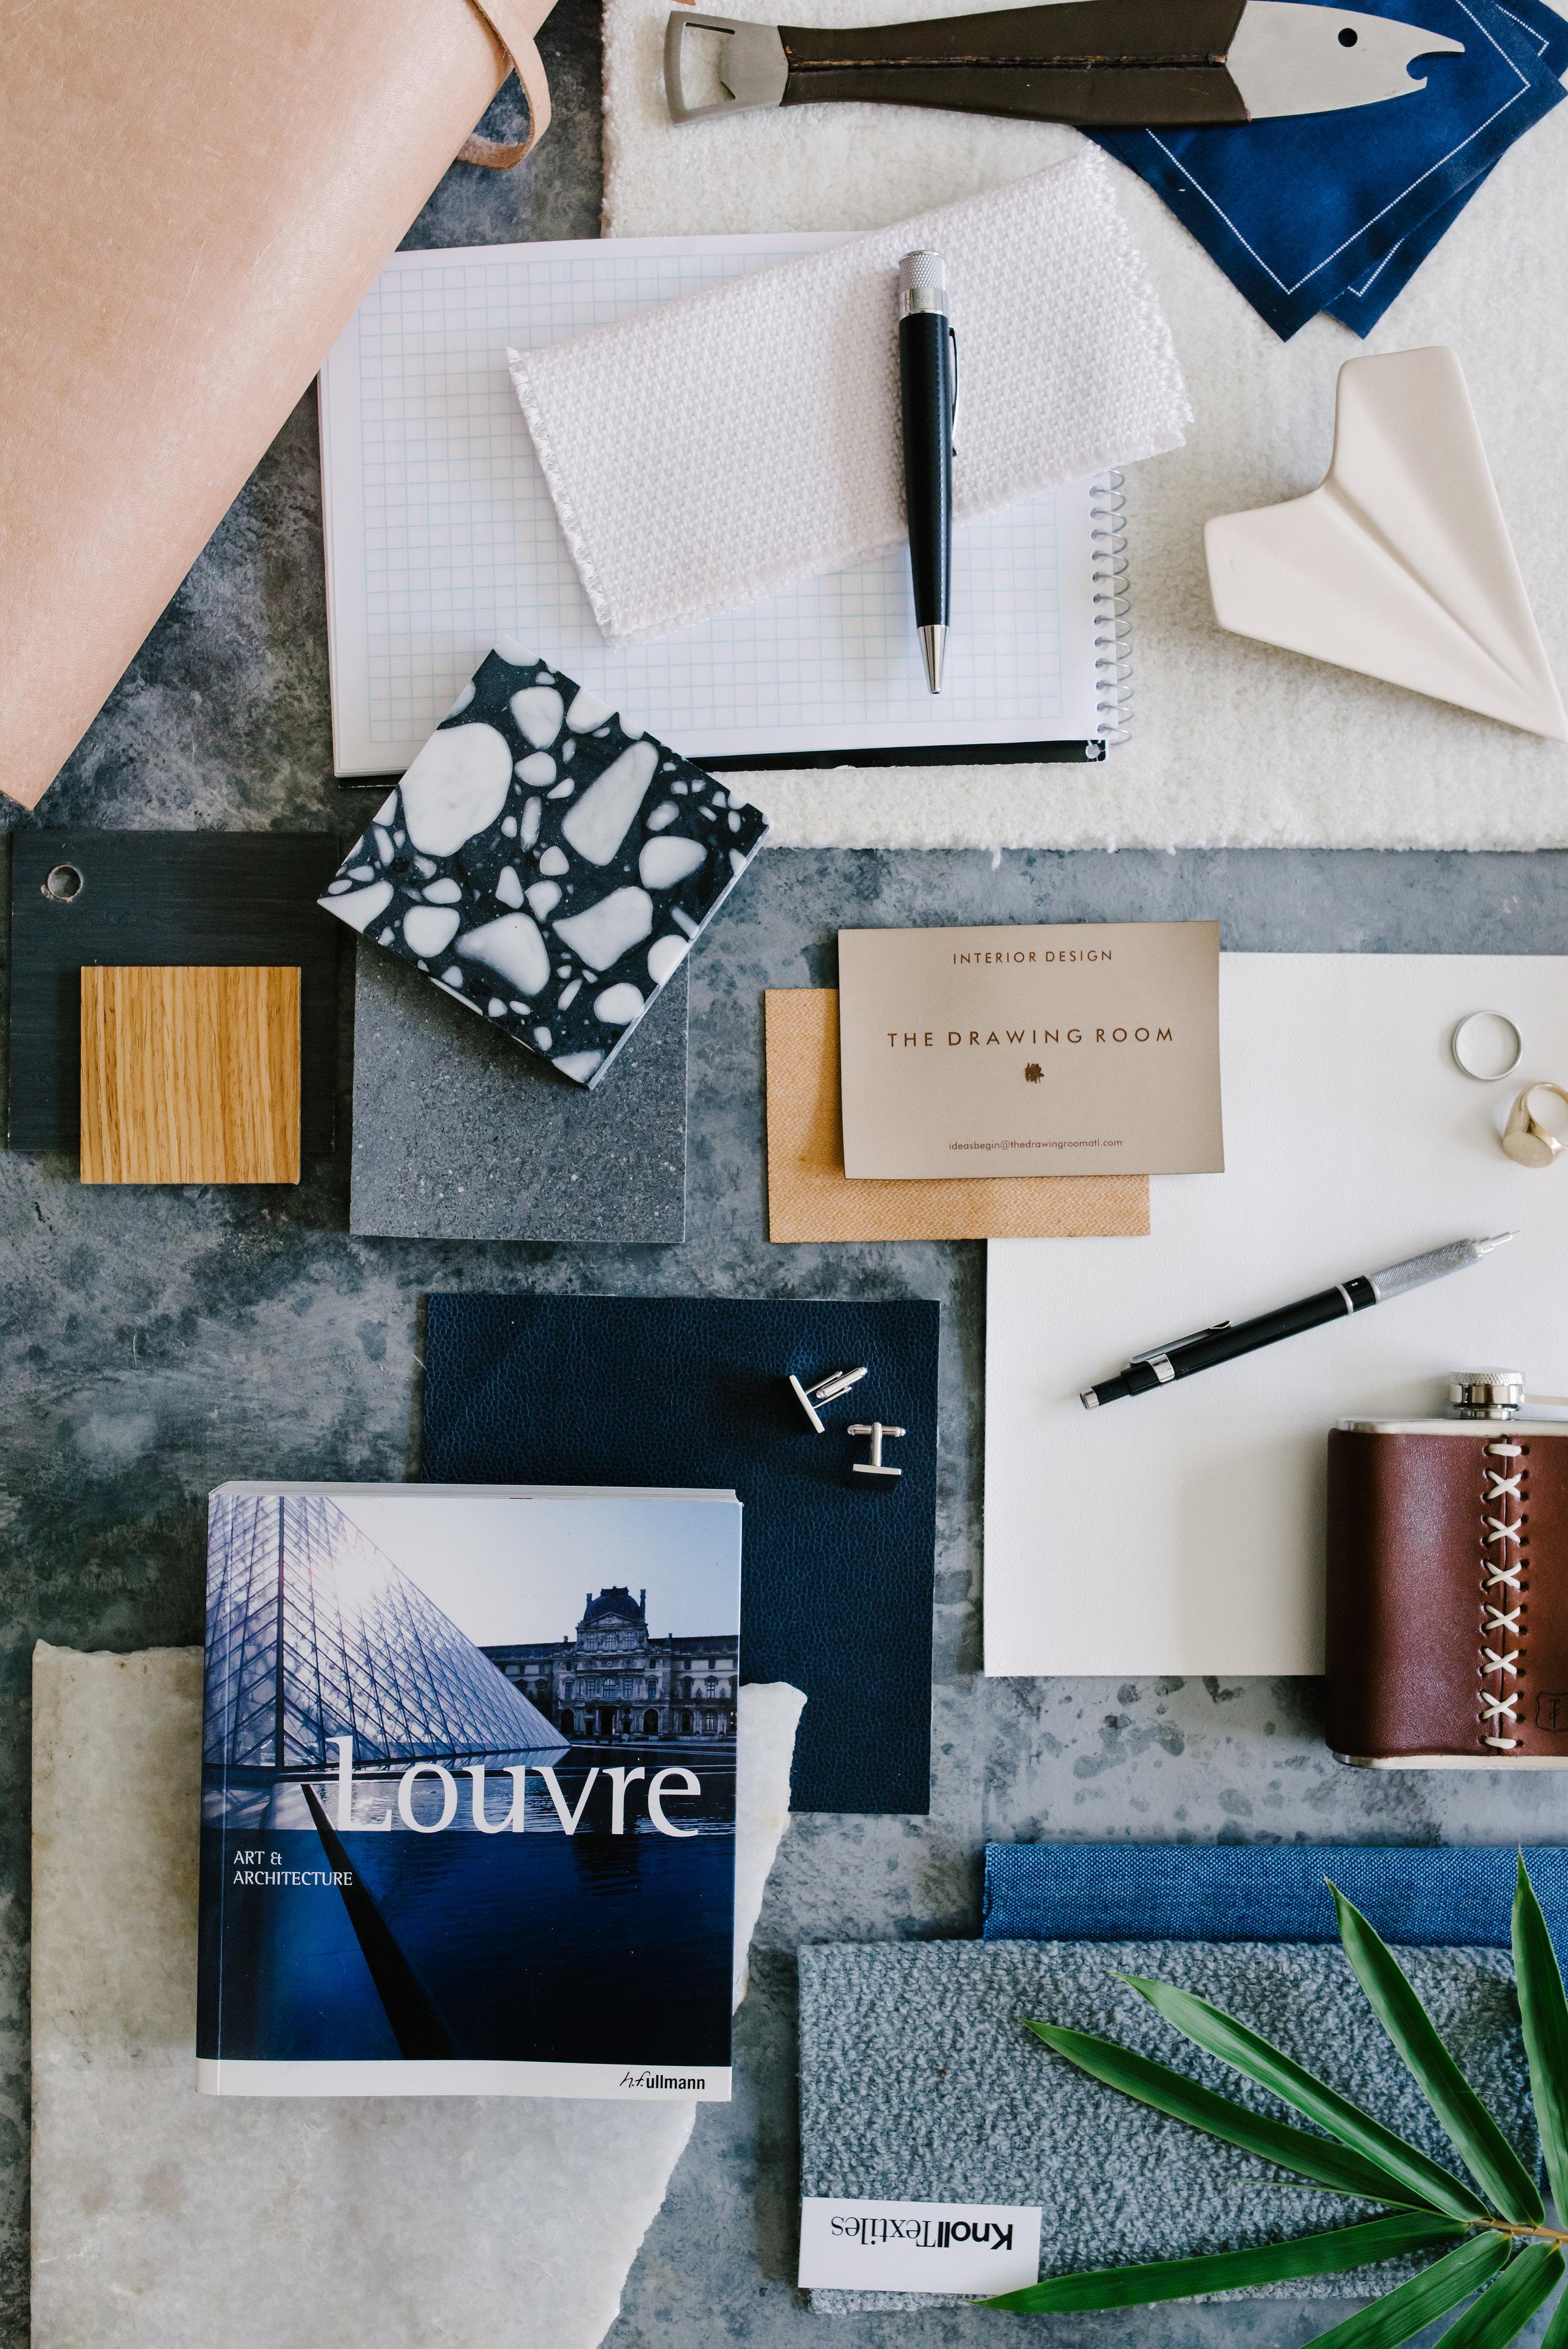 candicelorraine-styling-creativedirector-chapterseries-lost-unearthingtc-12.jpg